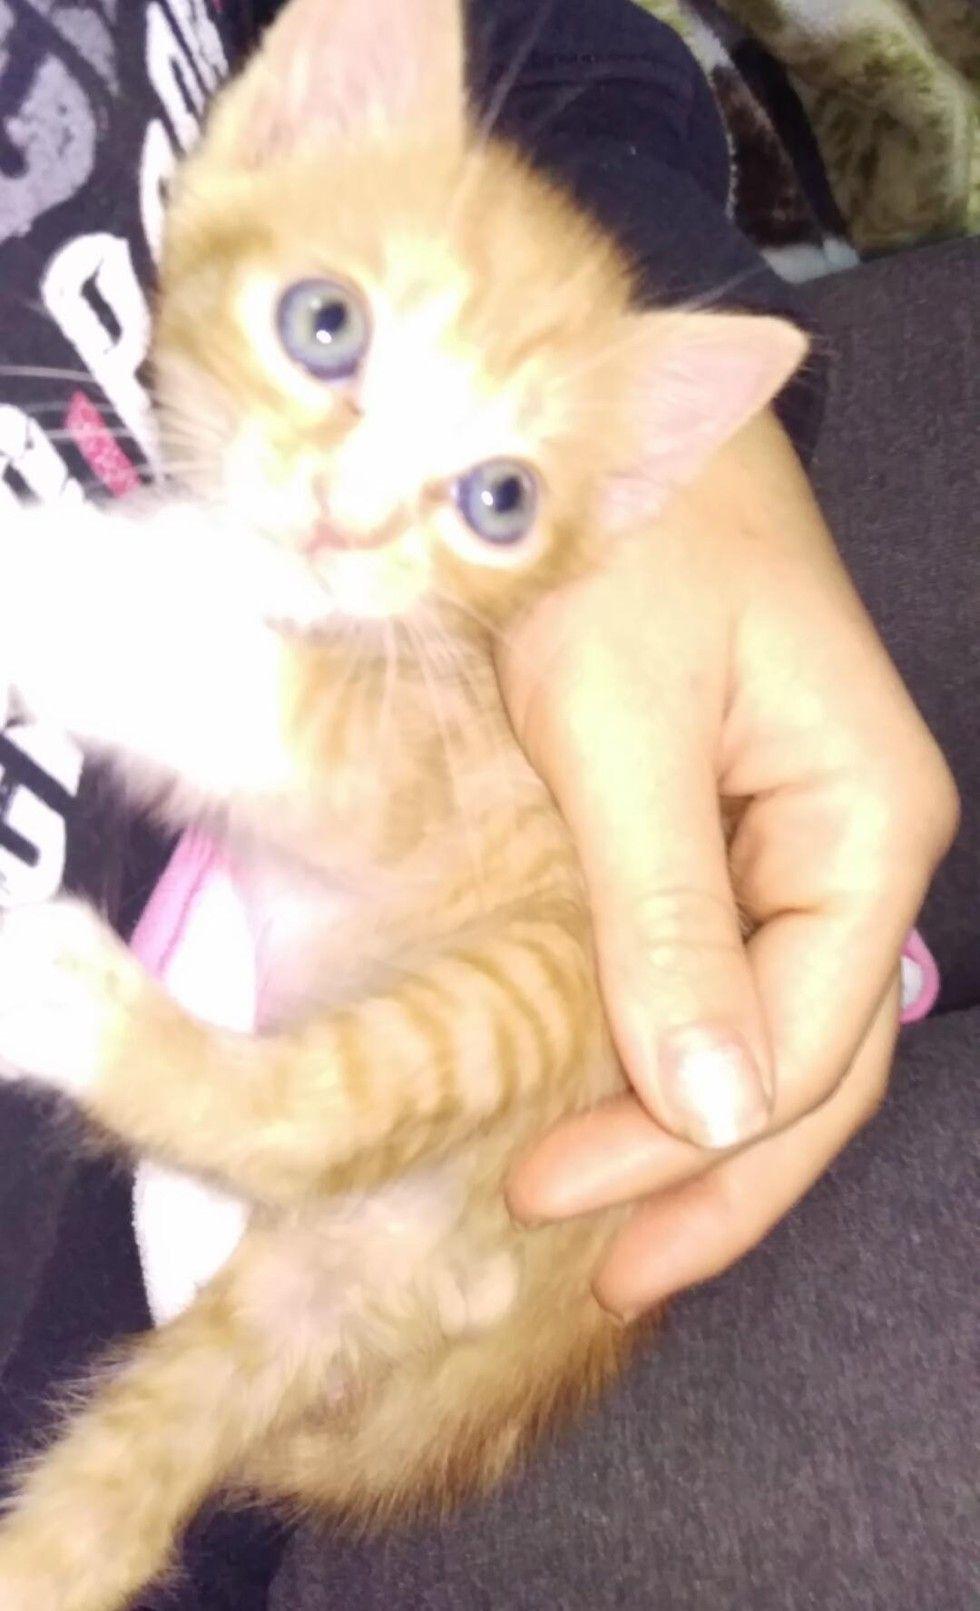 The Joy When Rescue Kitten Runs In His New Wheelchair Kitten Rescue Kitten Tiny Kitten